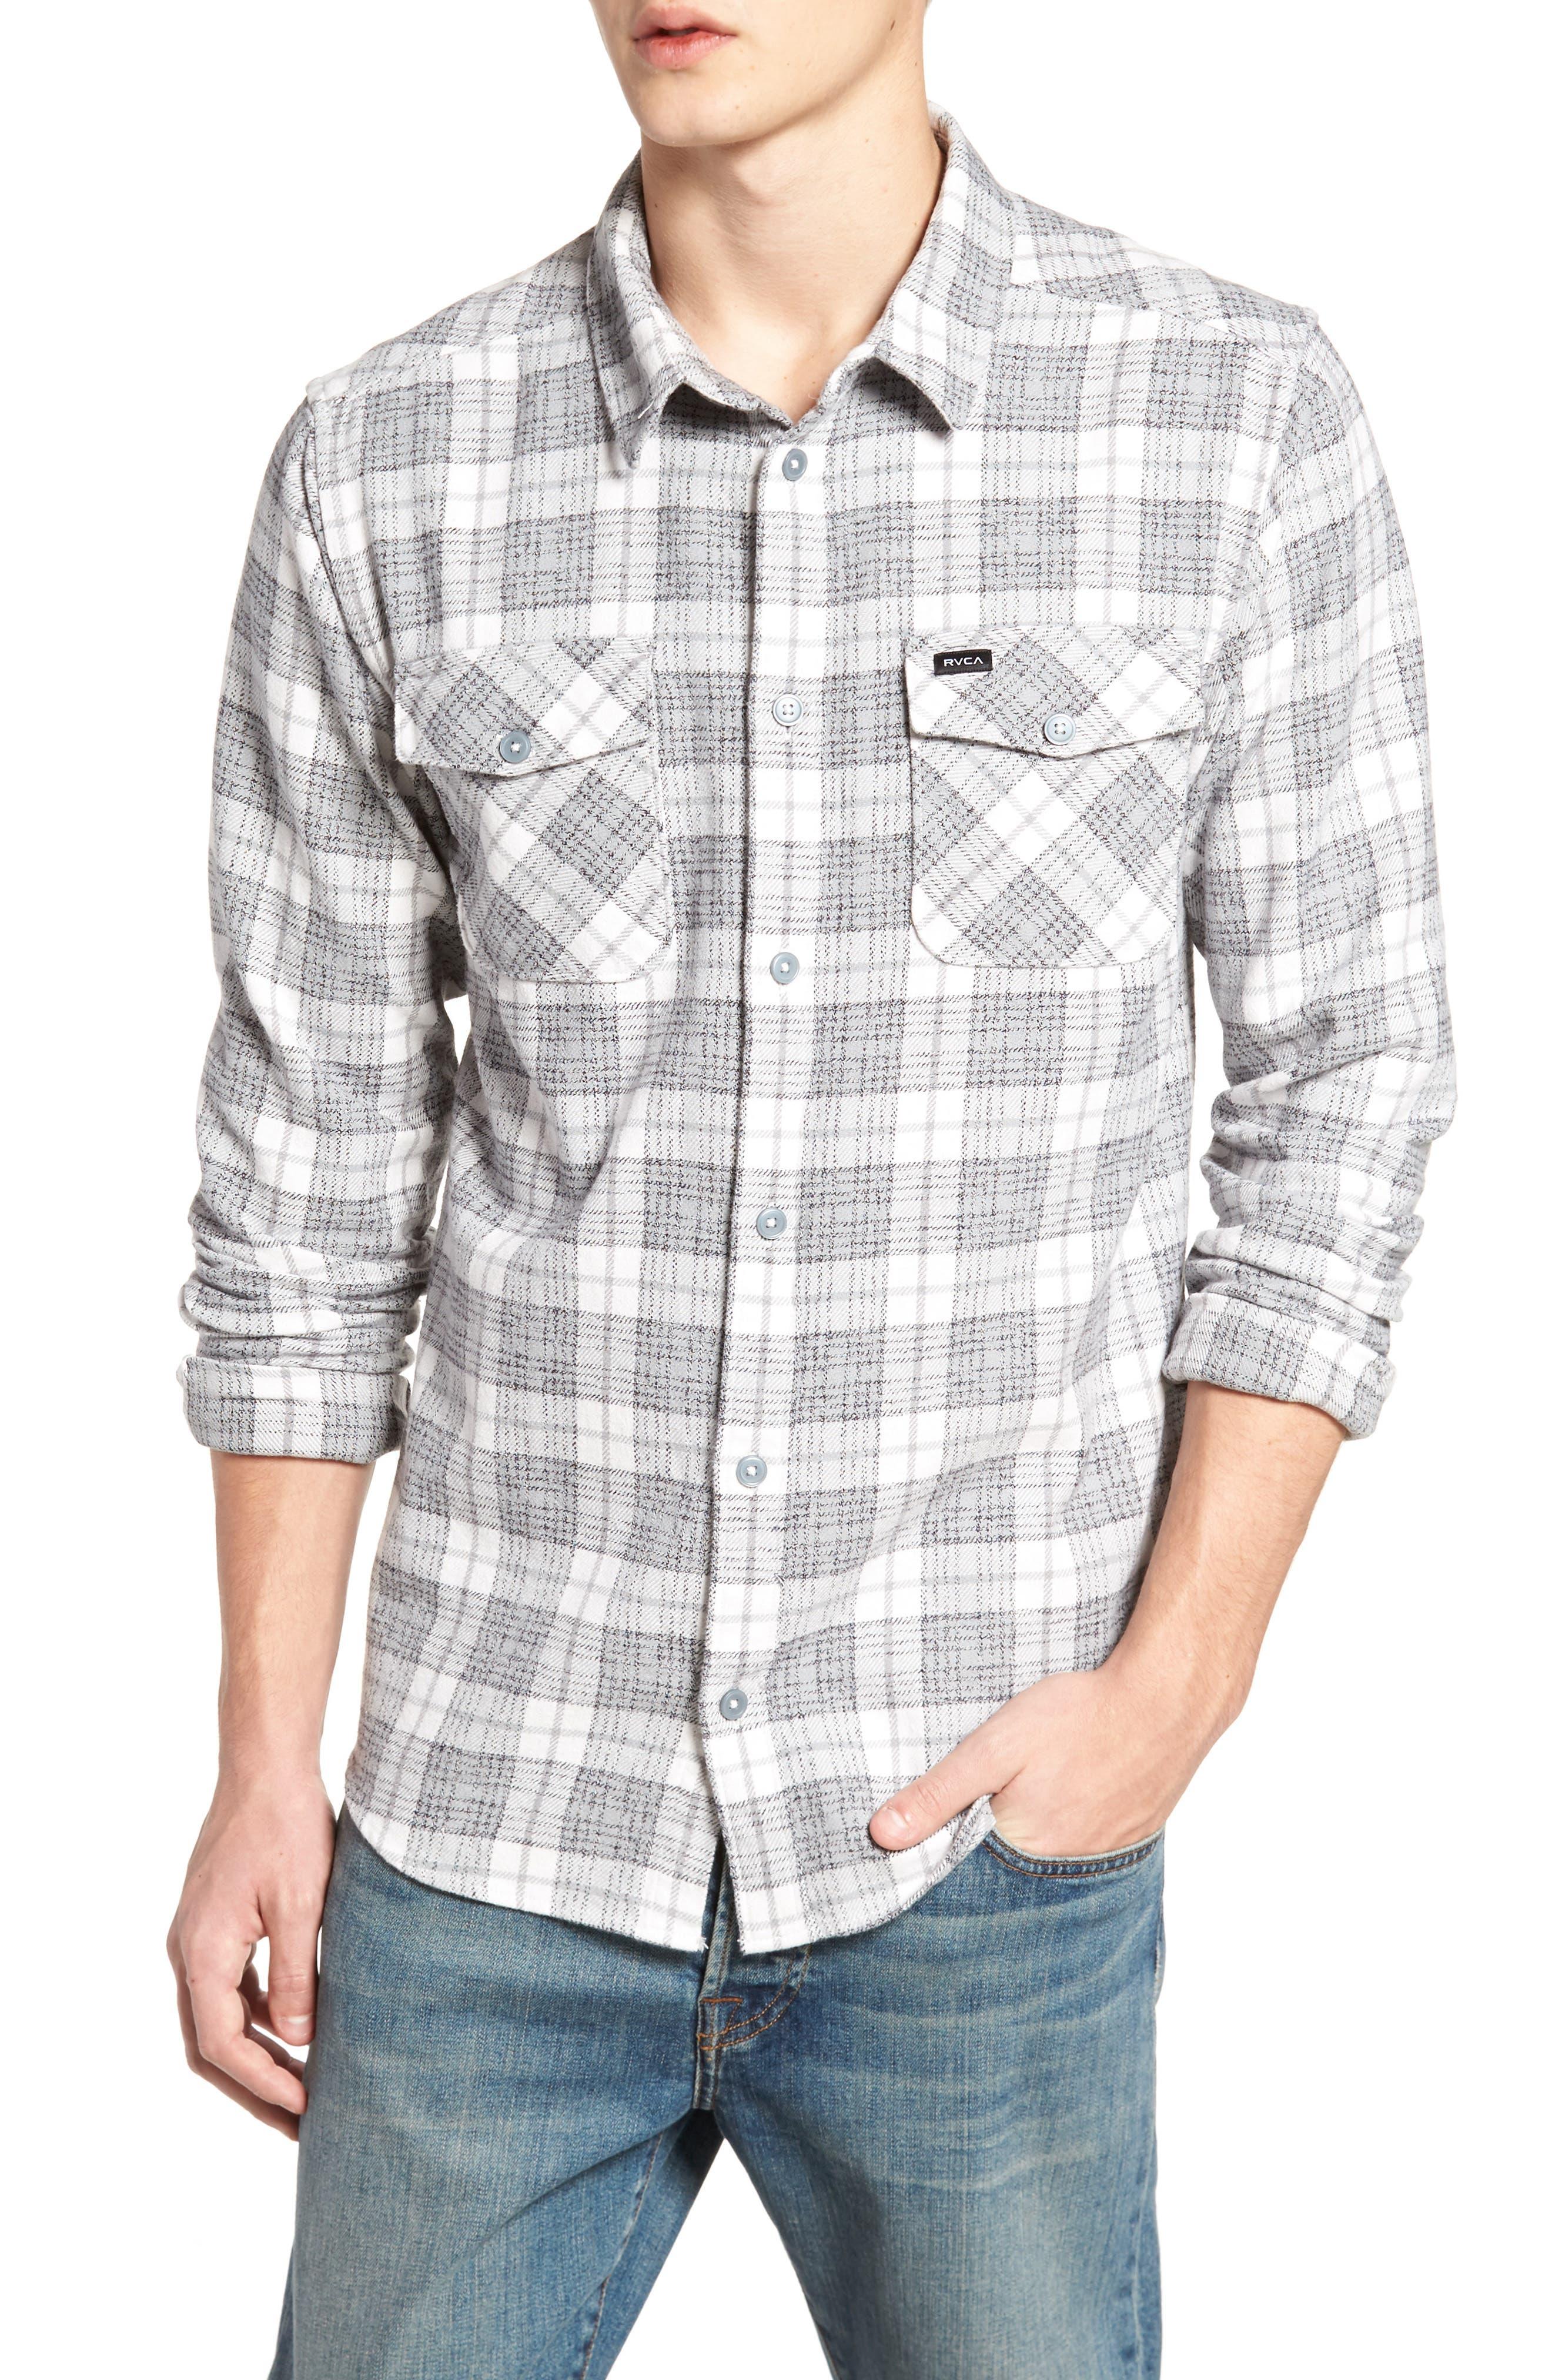 Main Image - RVCA 'That'll Work' Trim Fit Plaid Flannel Shirt